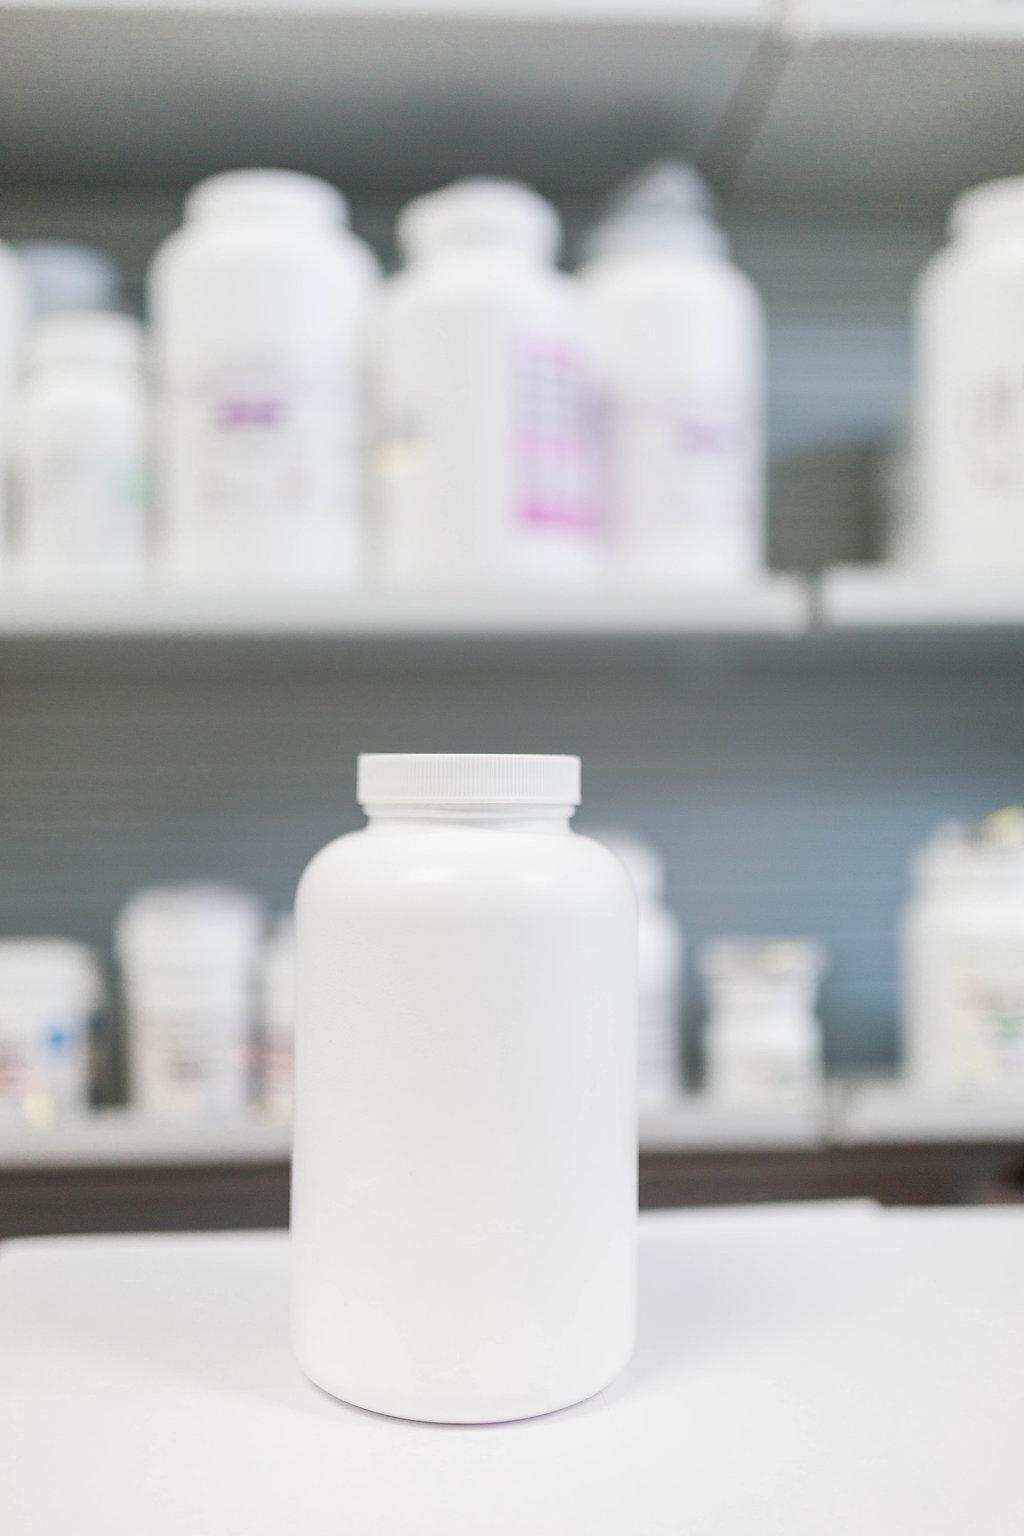 SVCP Riverton Utah compounding pharmacy